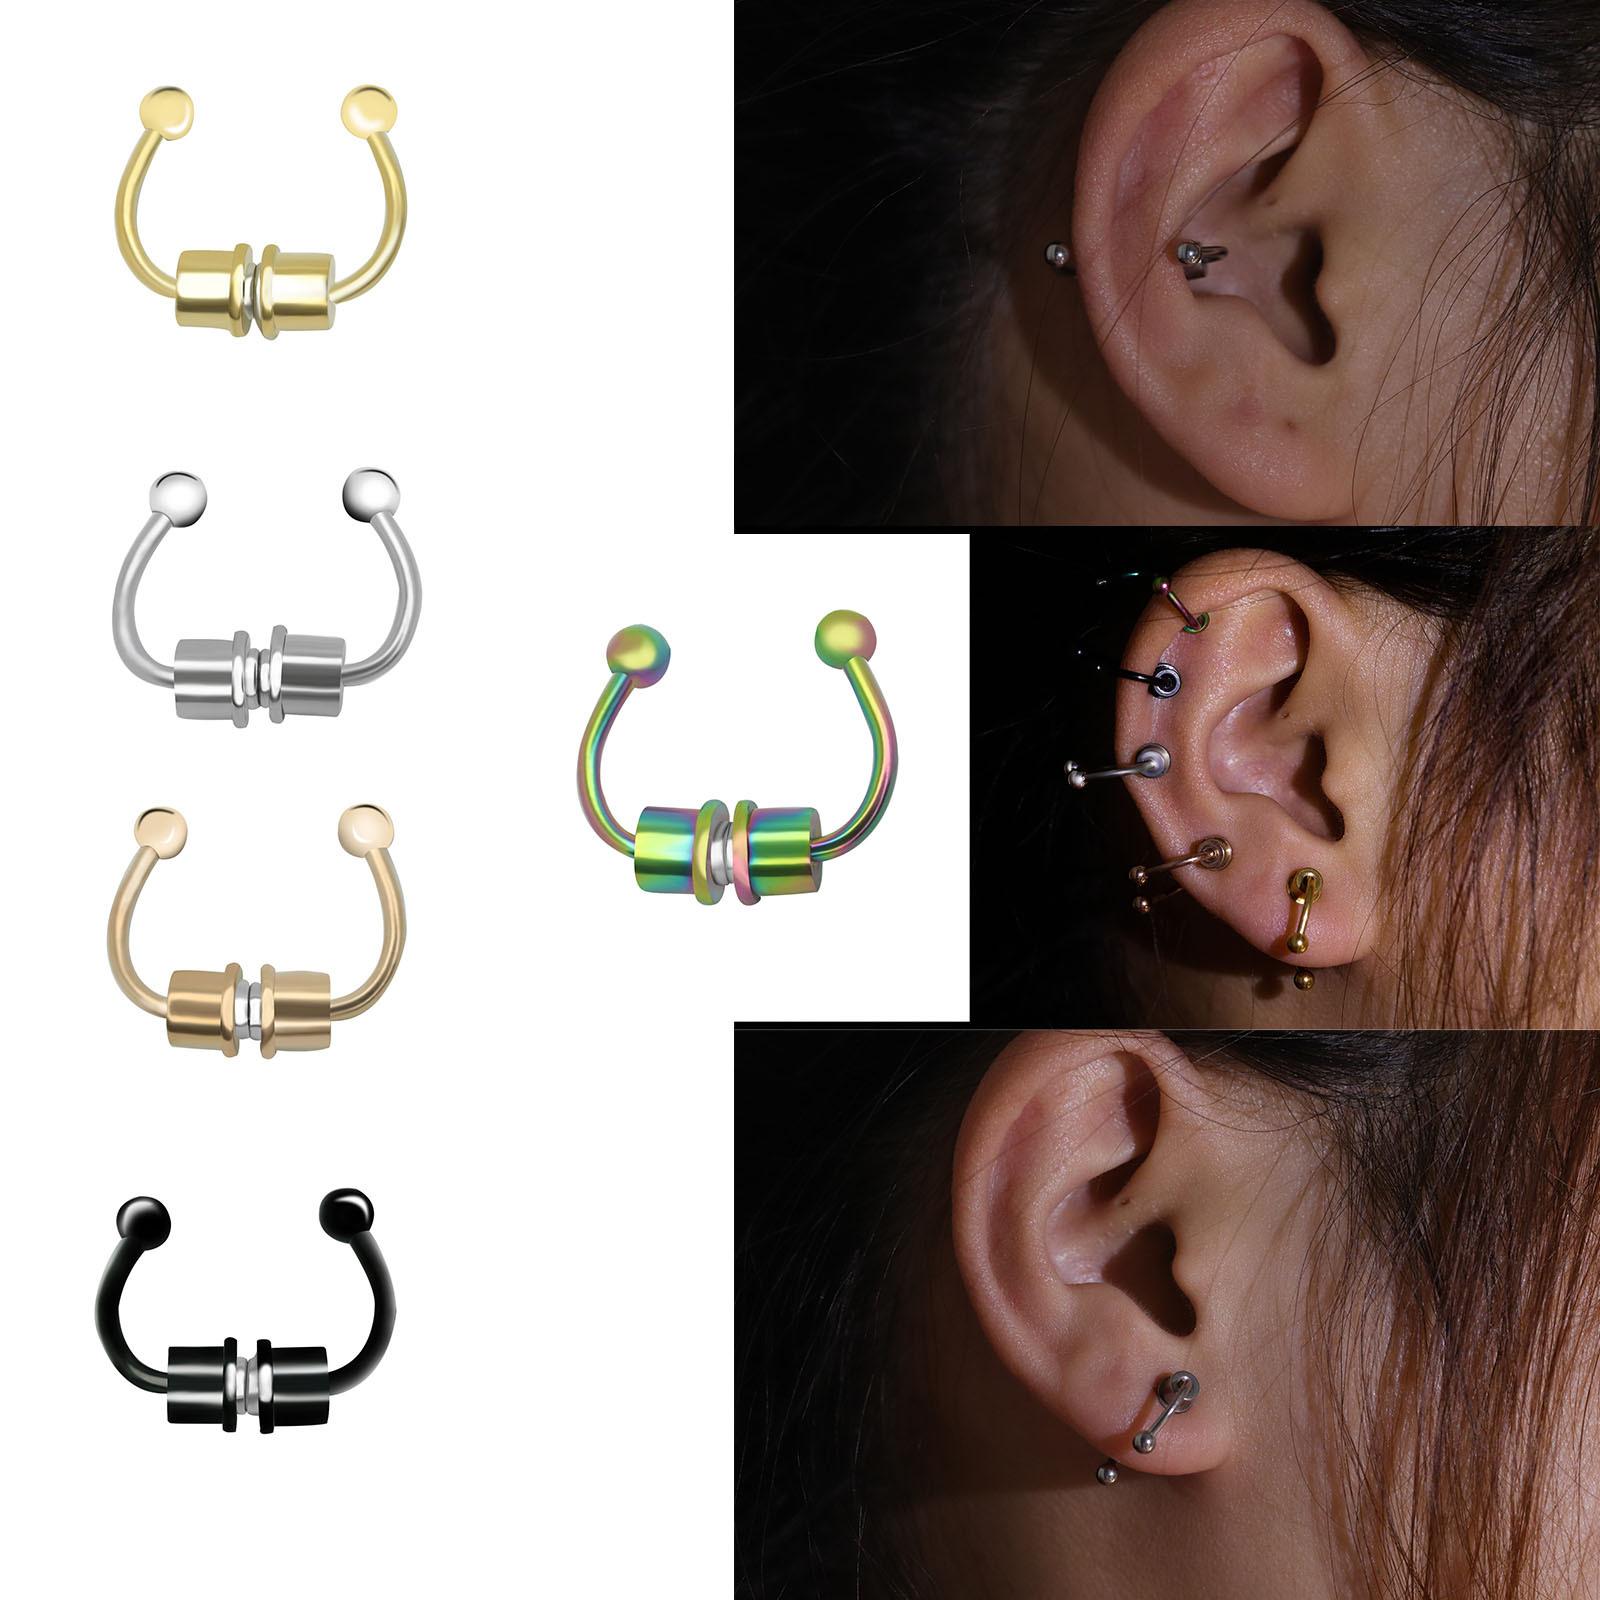 Stylish Titanium Steel Ear Stud Horseshoe Piercings for Street Fashion